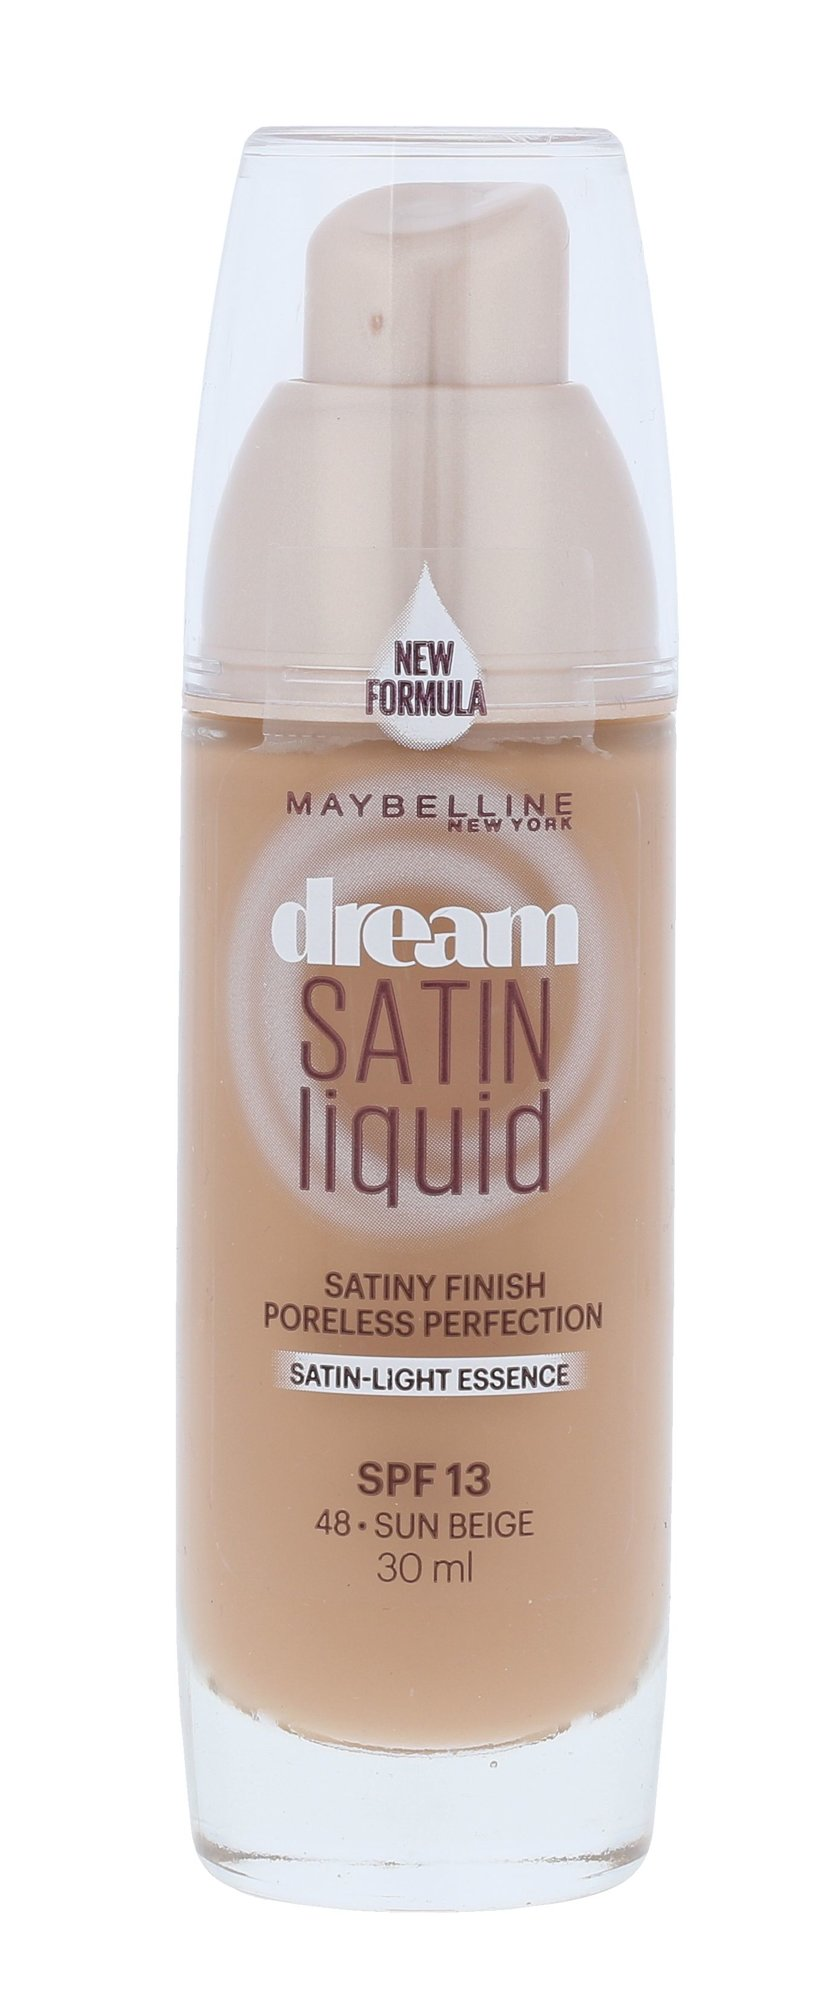 Maybelline Dream Satin Cosmetic 30ml 48 Sun Beige